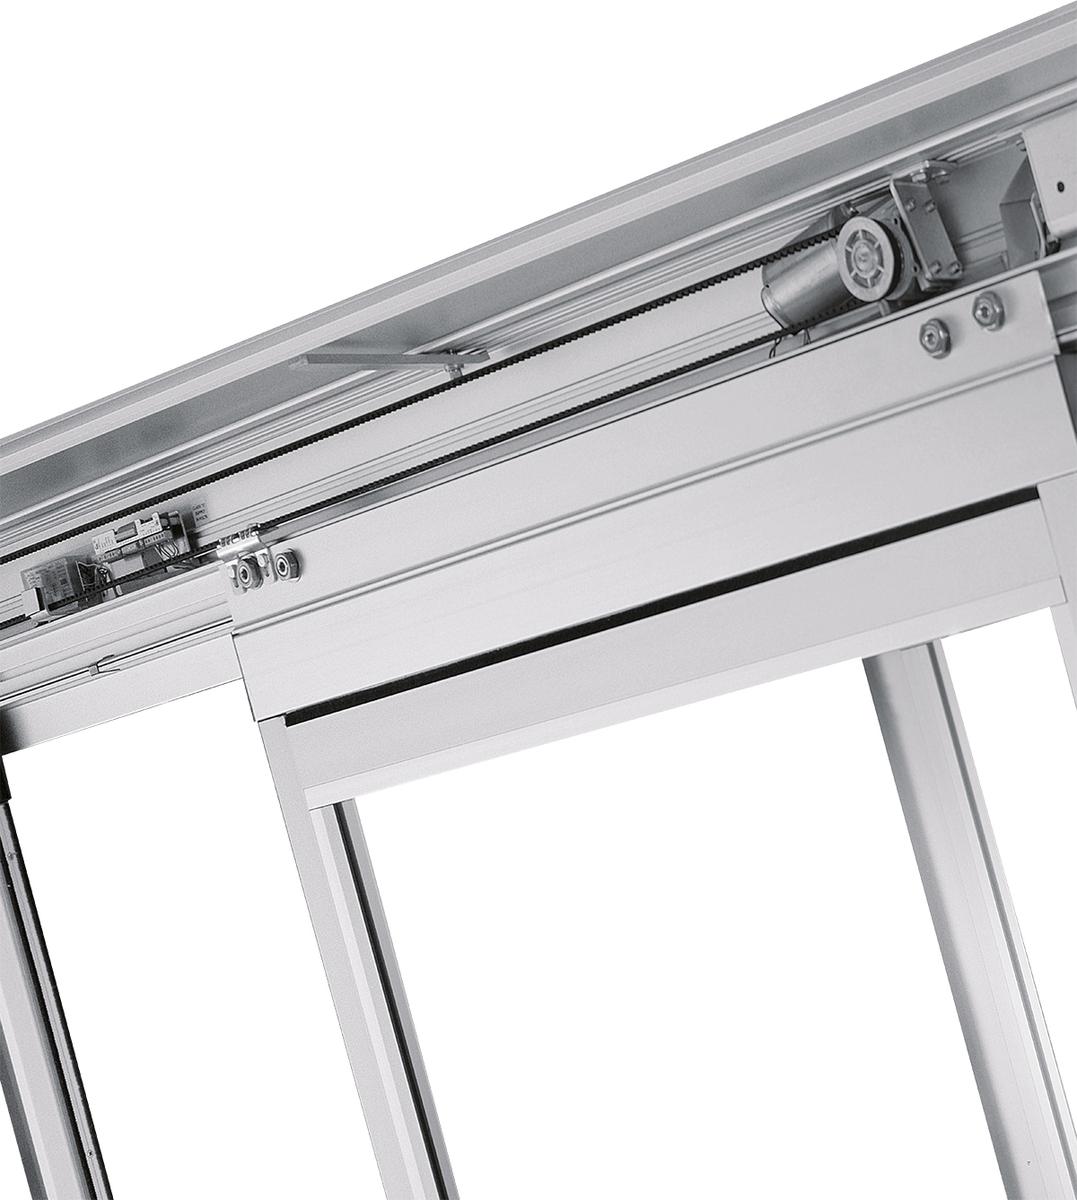 Dorma Esa 100 Commercial Fixed Panel Automatic Sliding Door